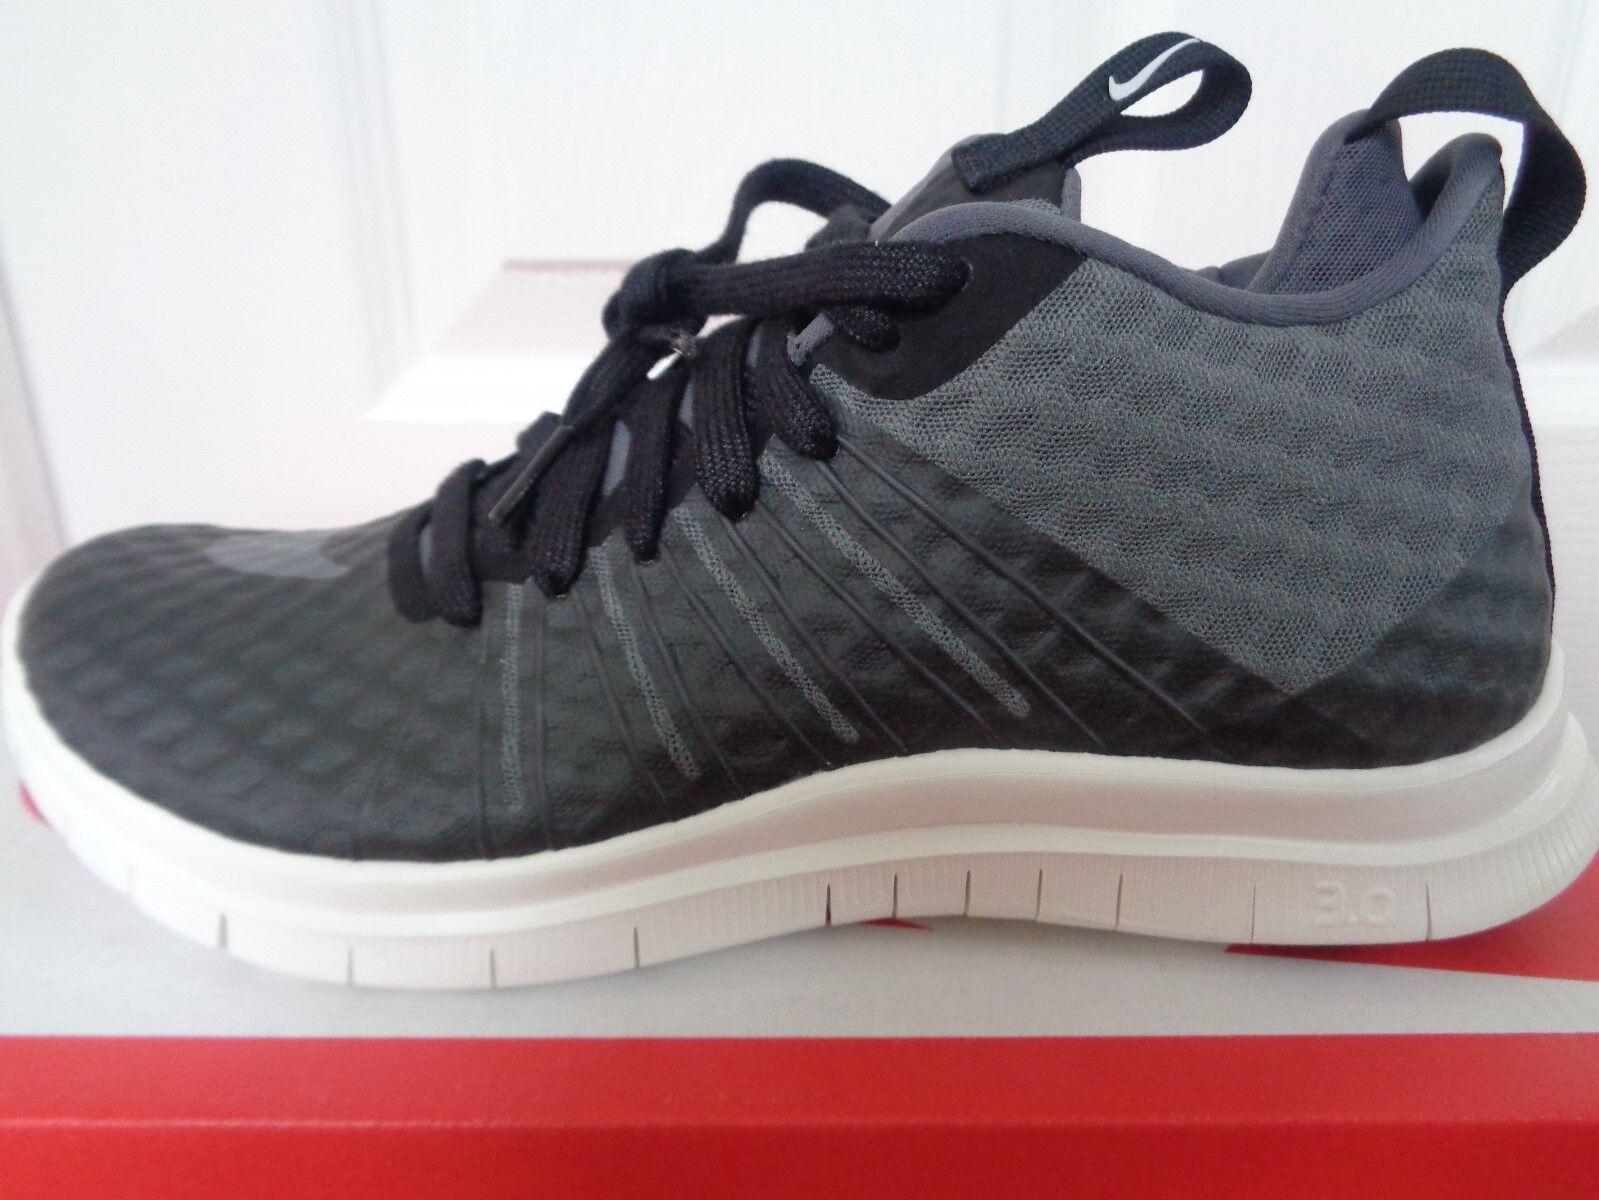 Nike Free Hypervenom 2 FS trainers trainers trainers Turnschuhe 805890 001 uk 6 eu 40 us 7 NEW+BOX a0455b